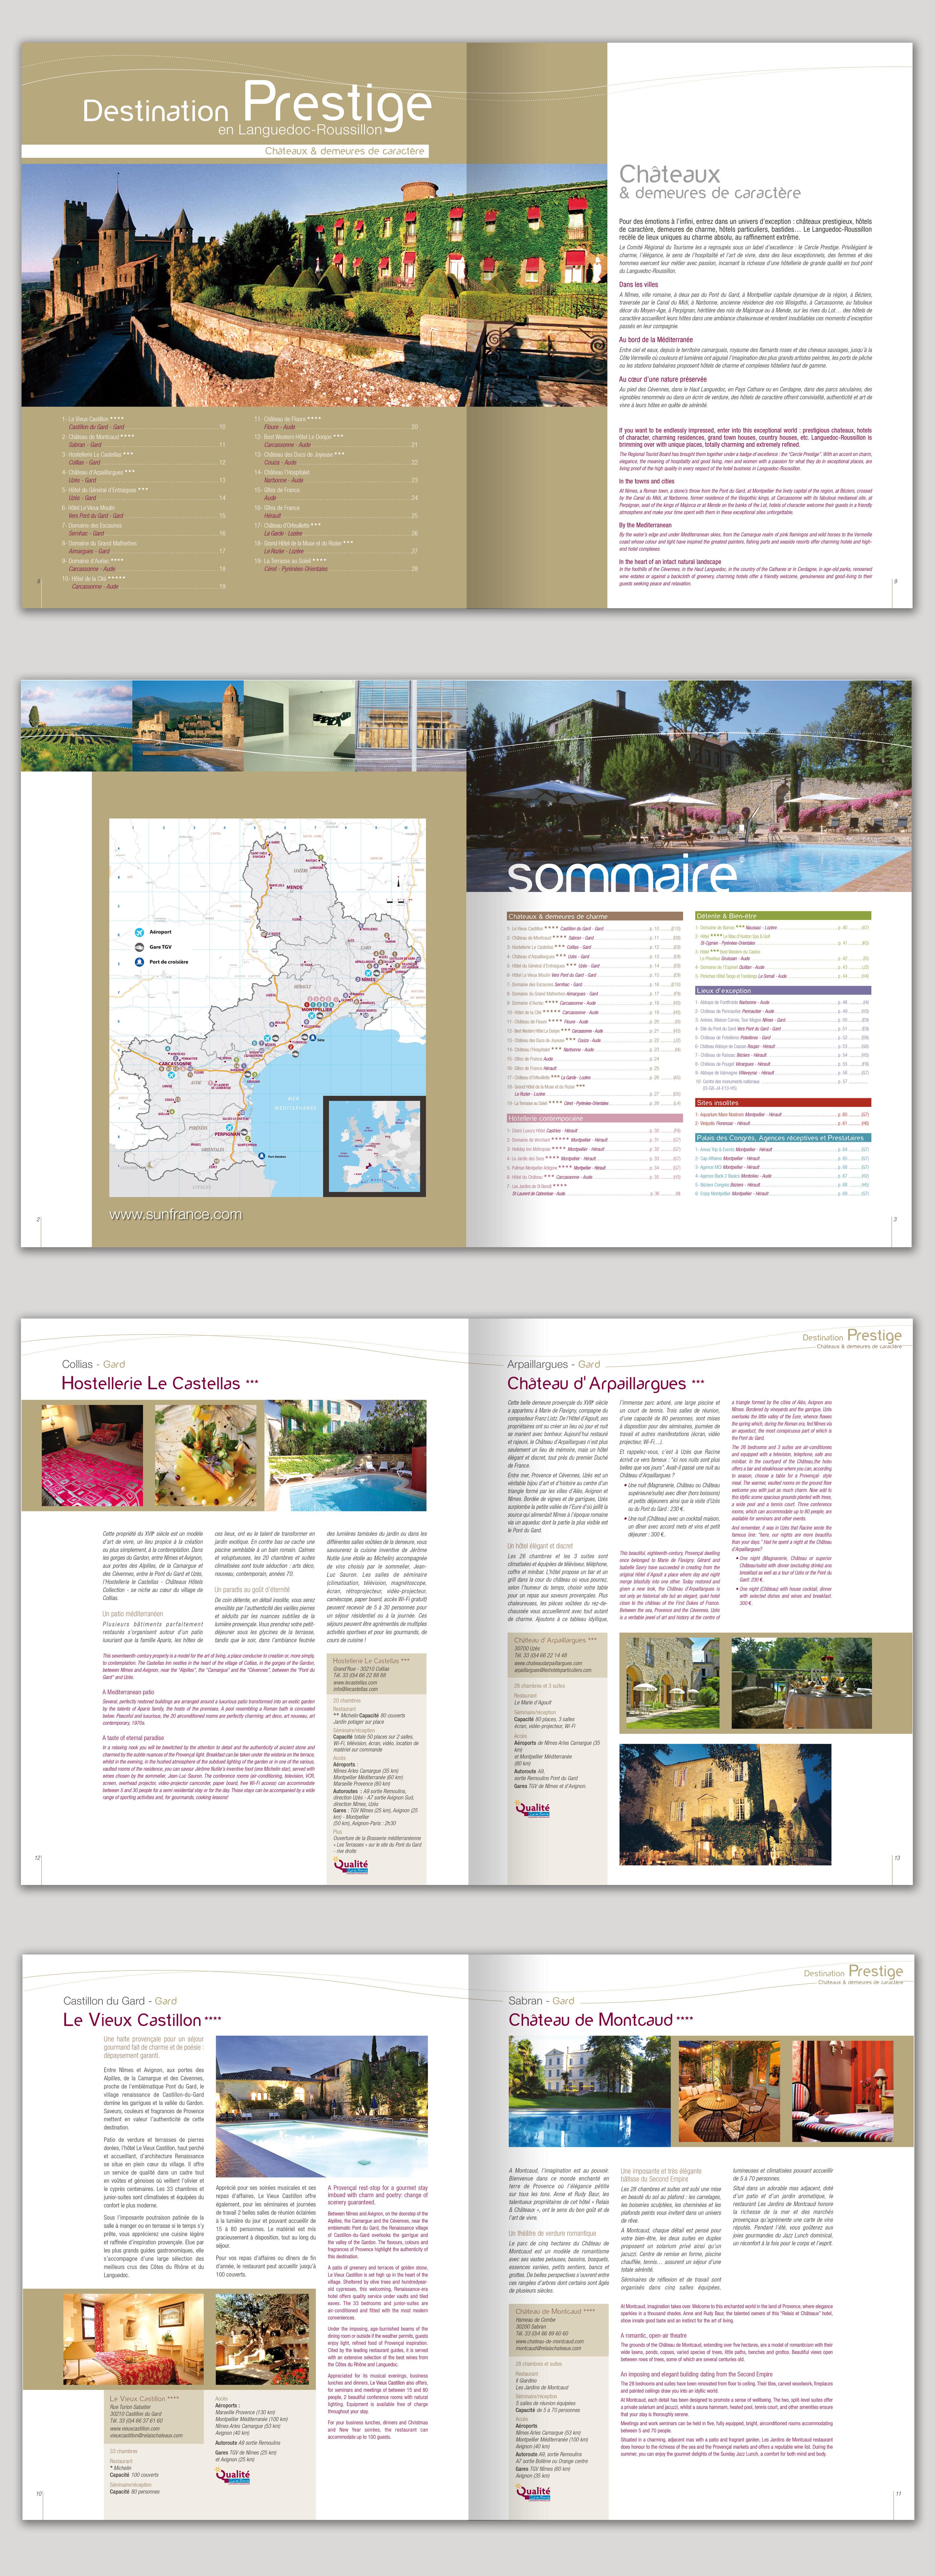 image-brochure-prestige2-02.jpg